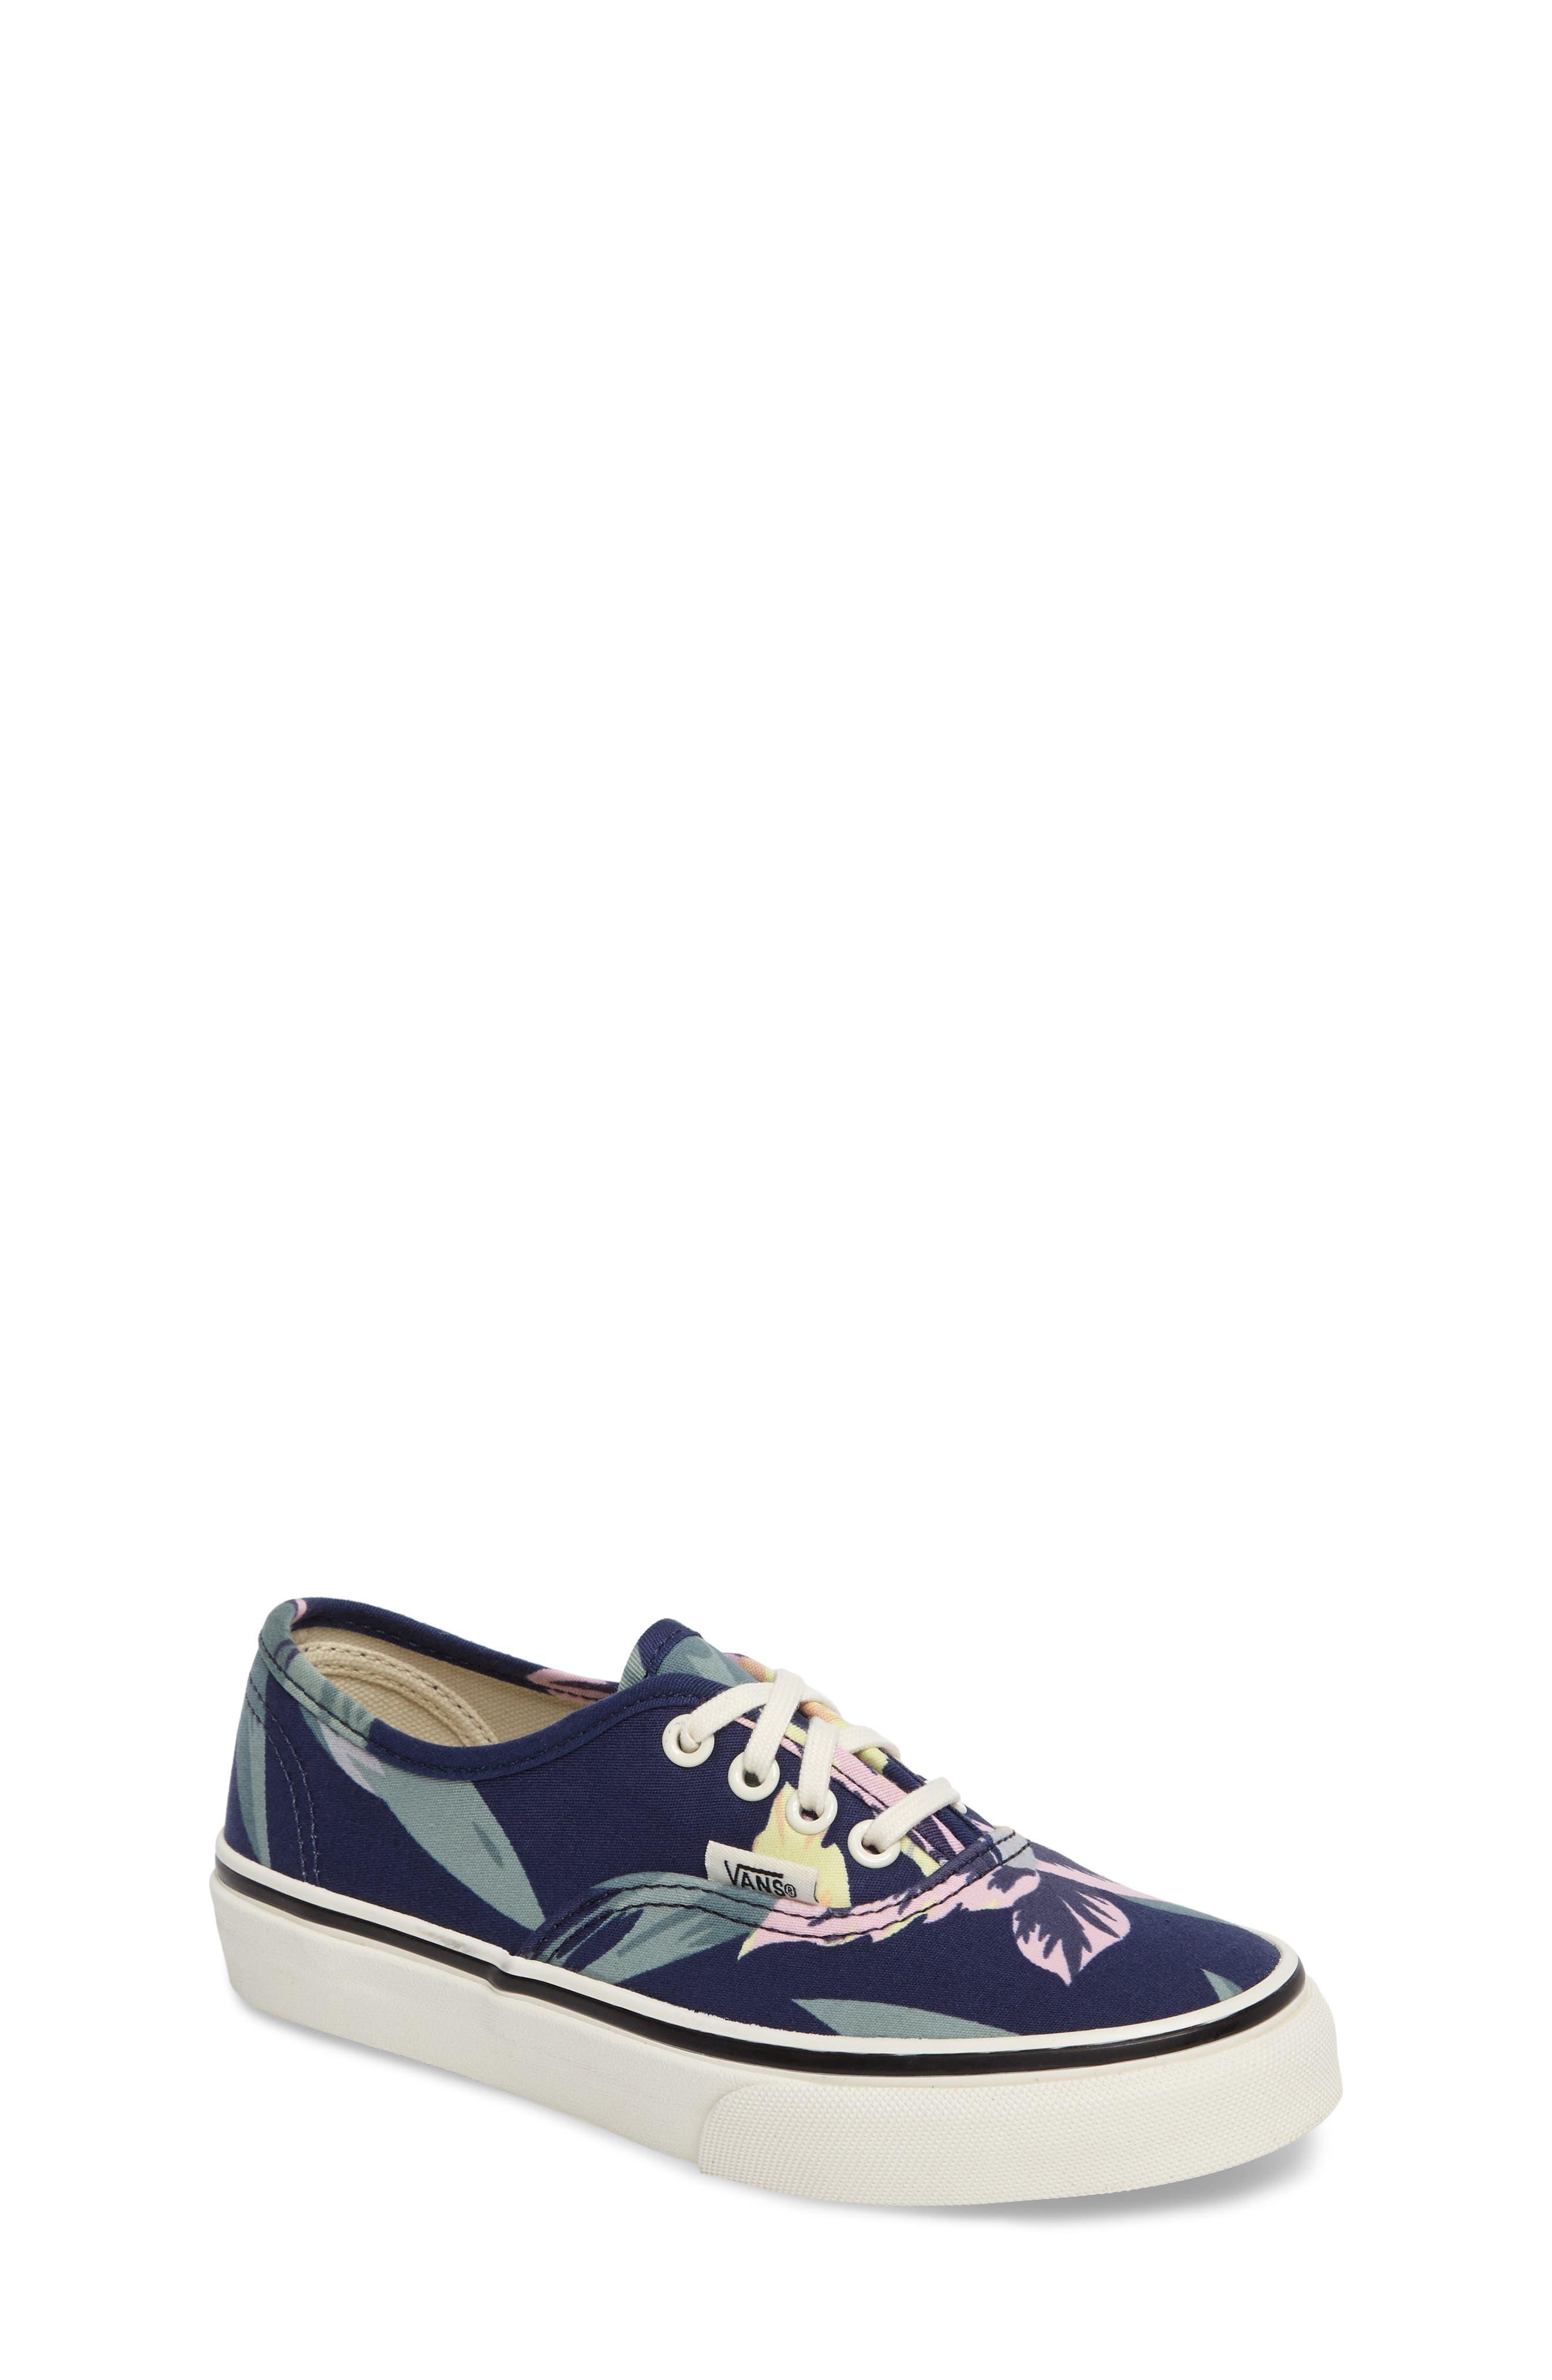 Alternate Image 1 Selected - Vans Authentic Floral Print Sneaker (Toddler, Little Kid & Big Kid)